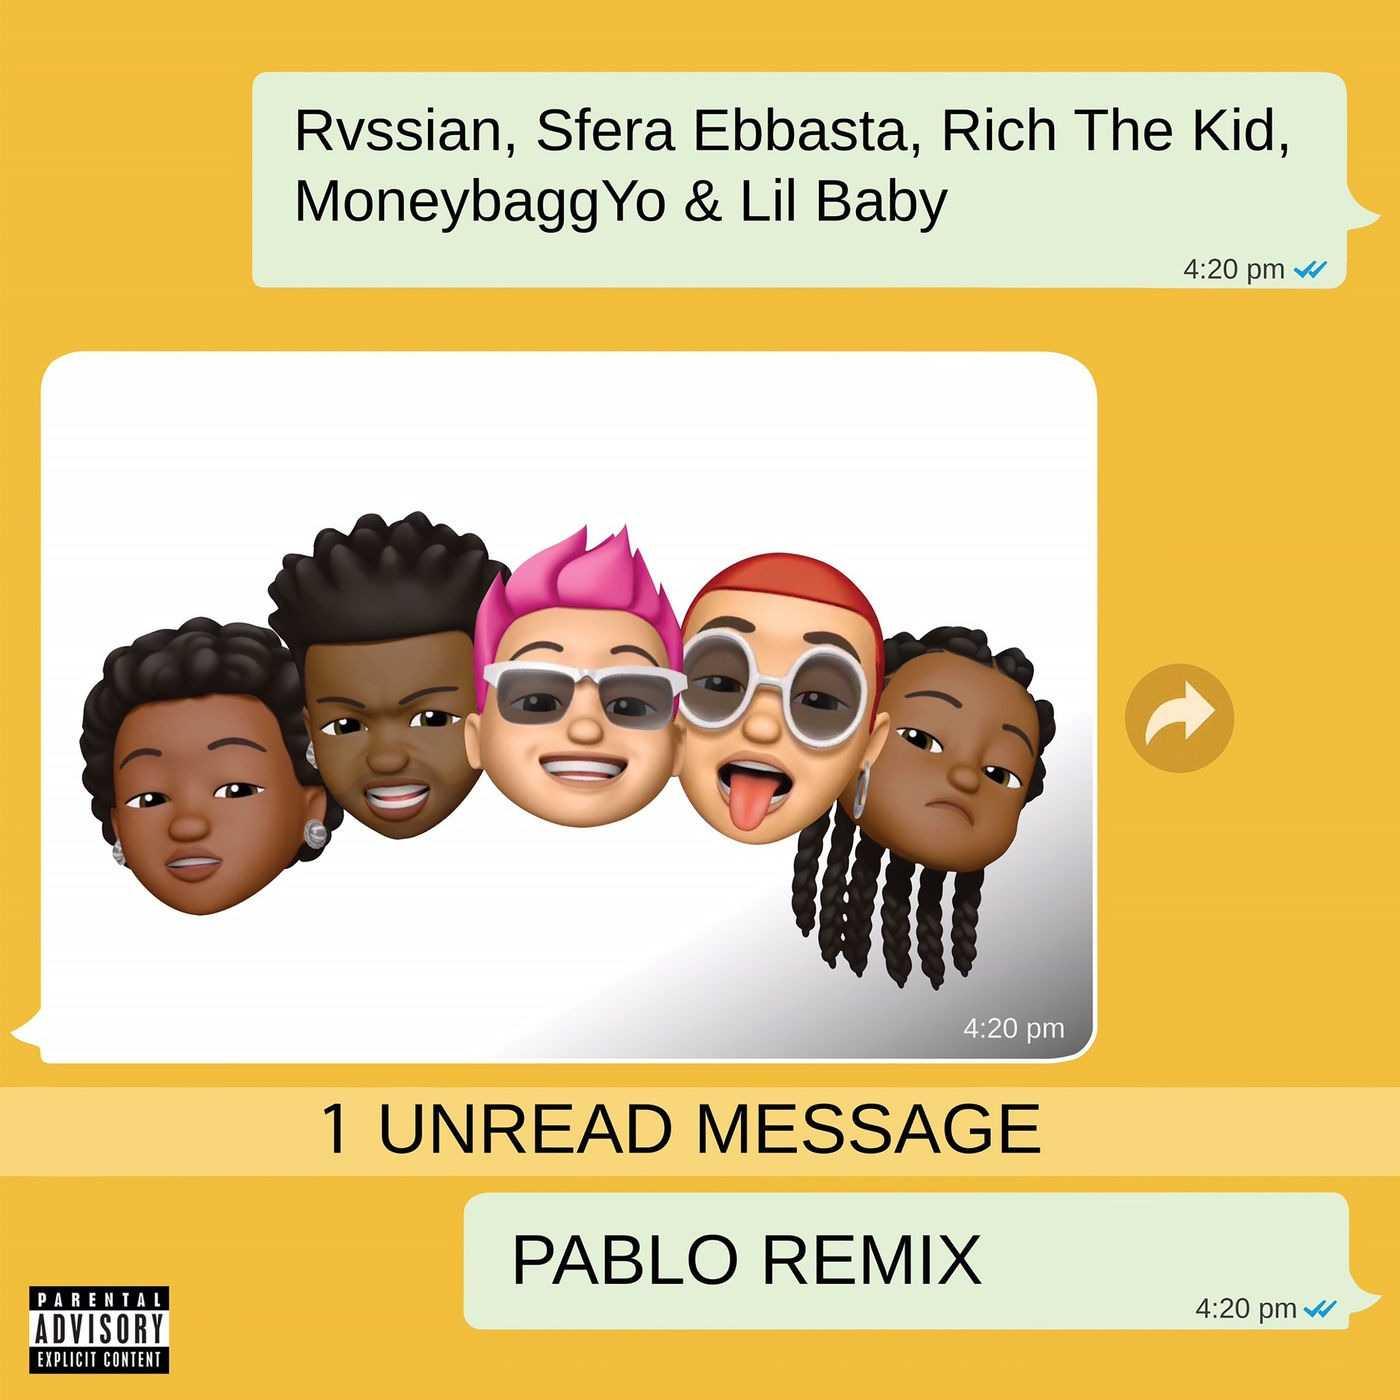 Rvssian, Sfera Ebbasta & Rich The Kid | Pablo (feat. Moneybagg Yo & Lil Baby) (Remix) [Audio]